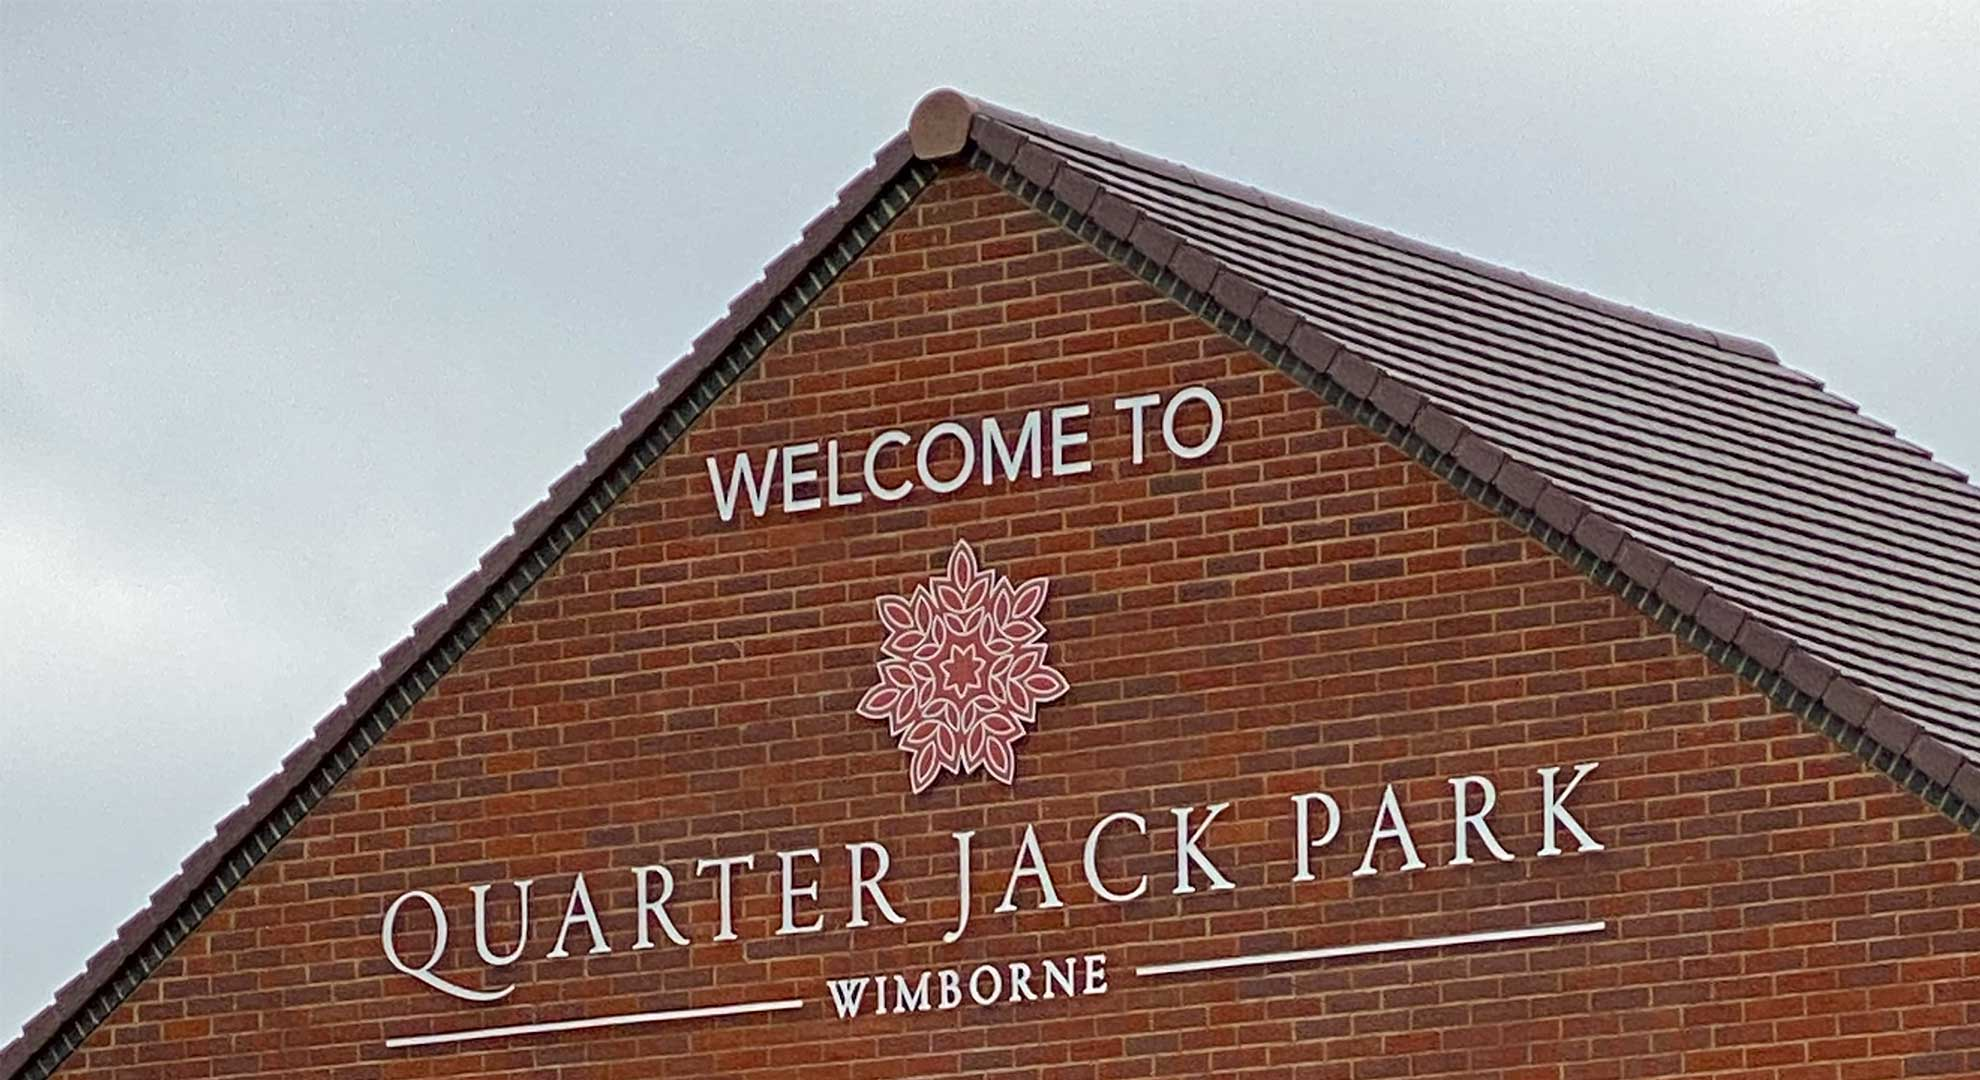 Quarter Jack Park